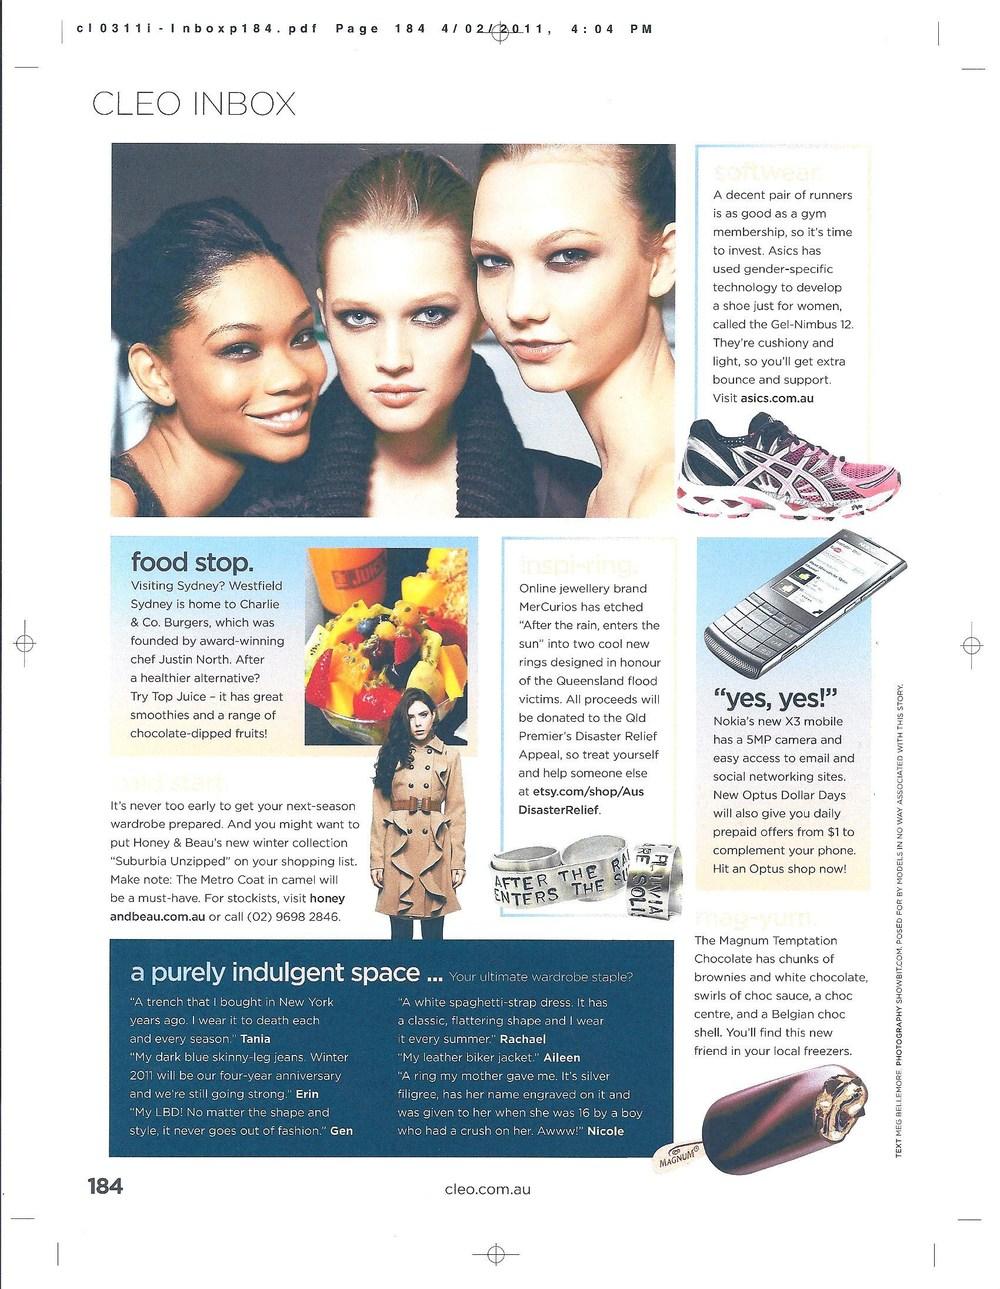 CLEO Magazine, March 2011